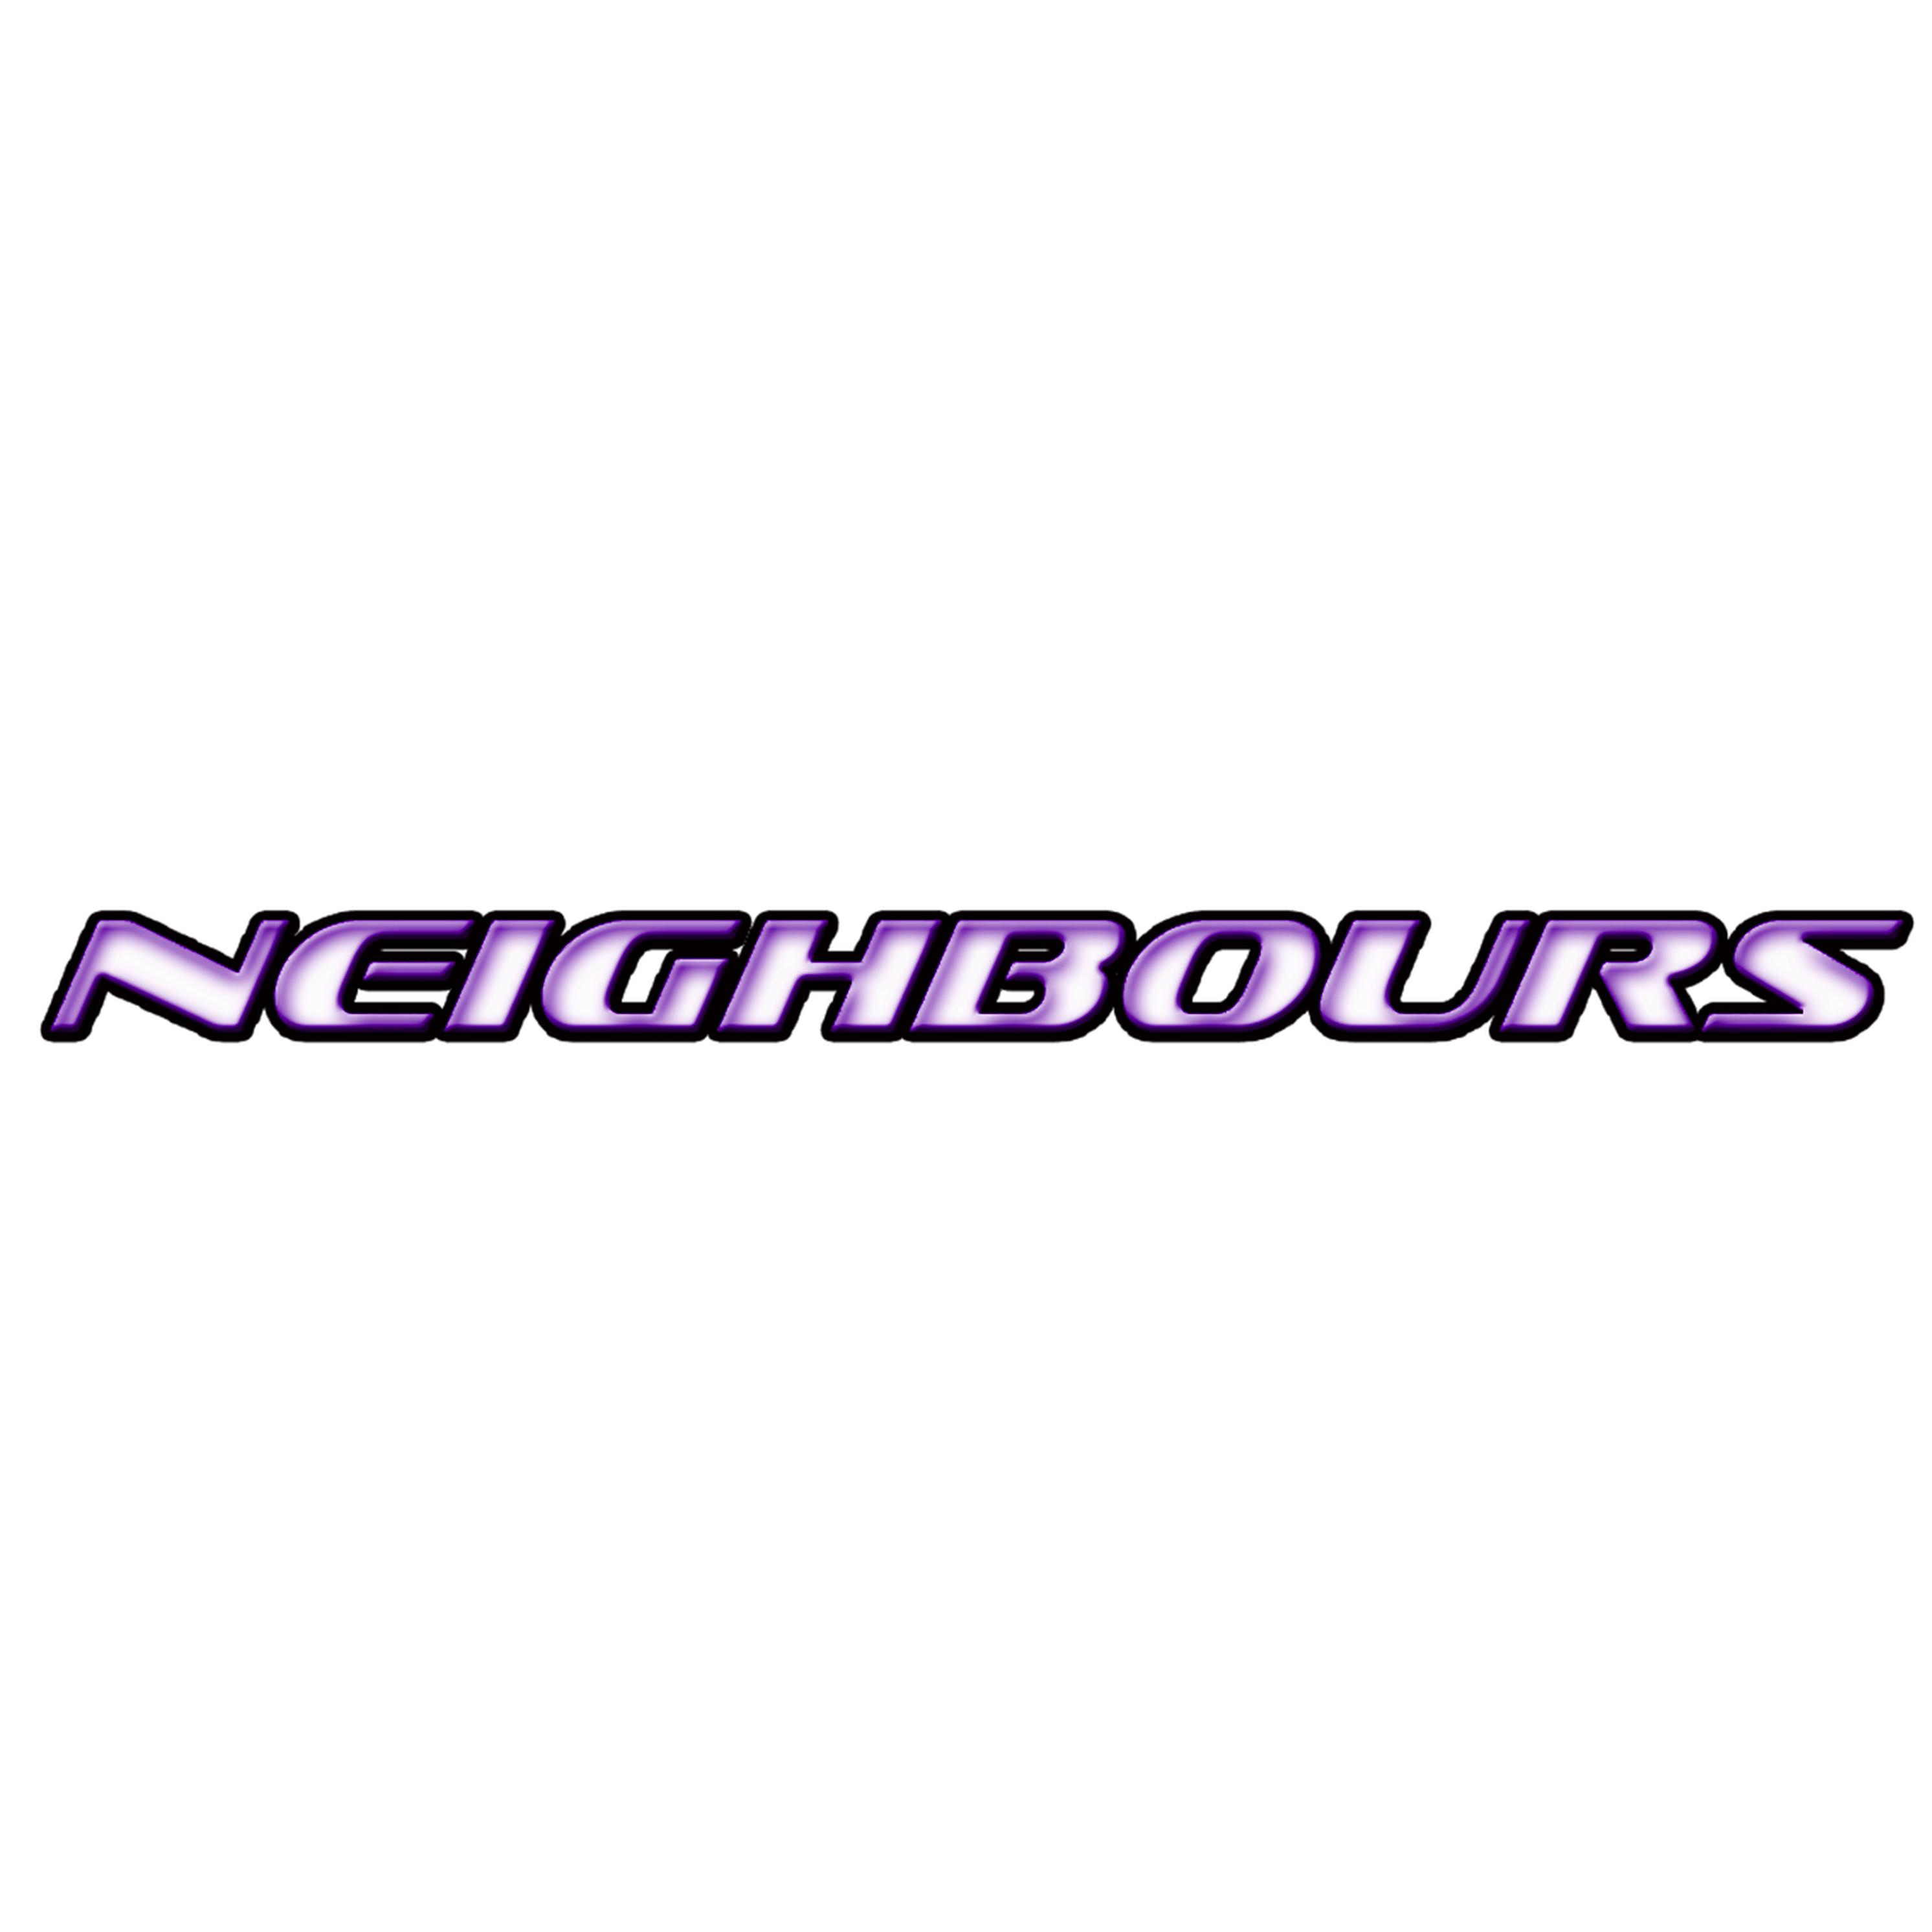 Neighbours Nightclub - Seattle, WA - Bars & Clubs